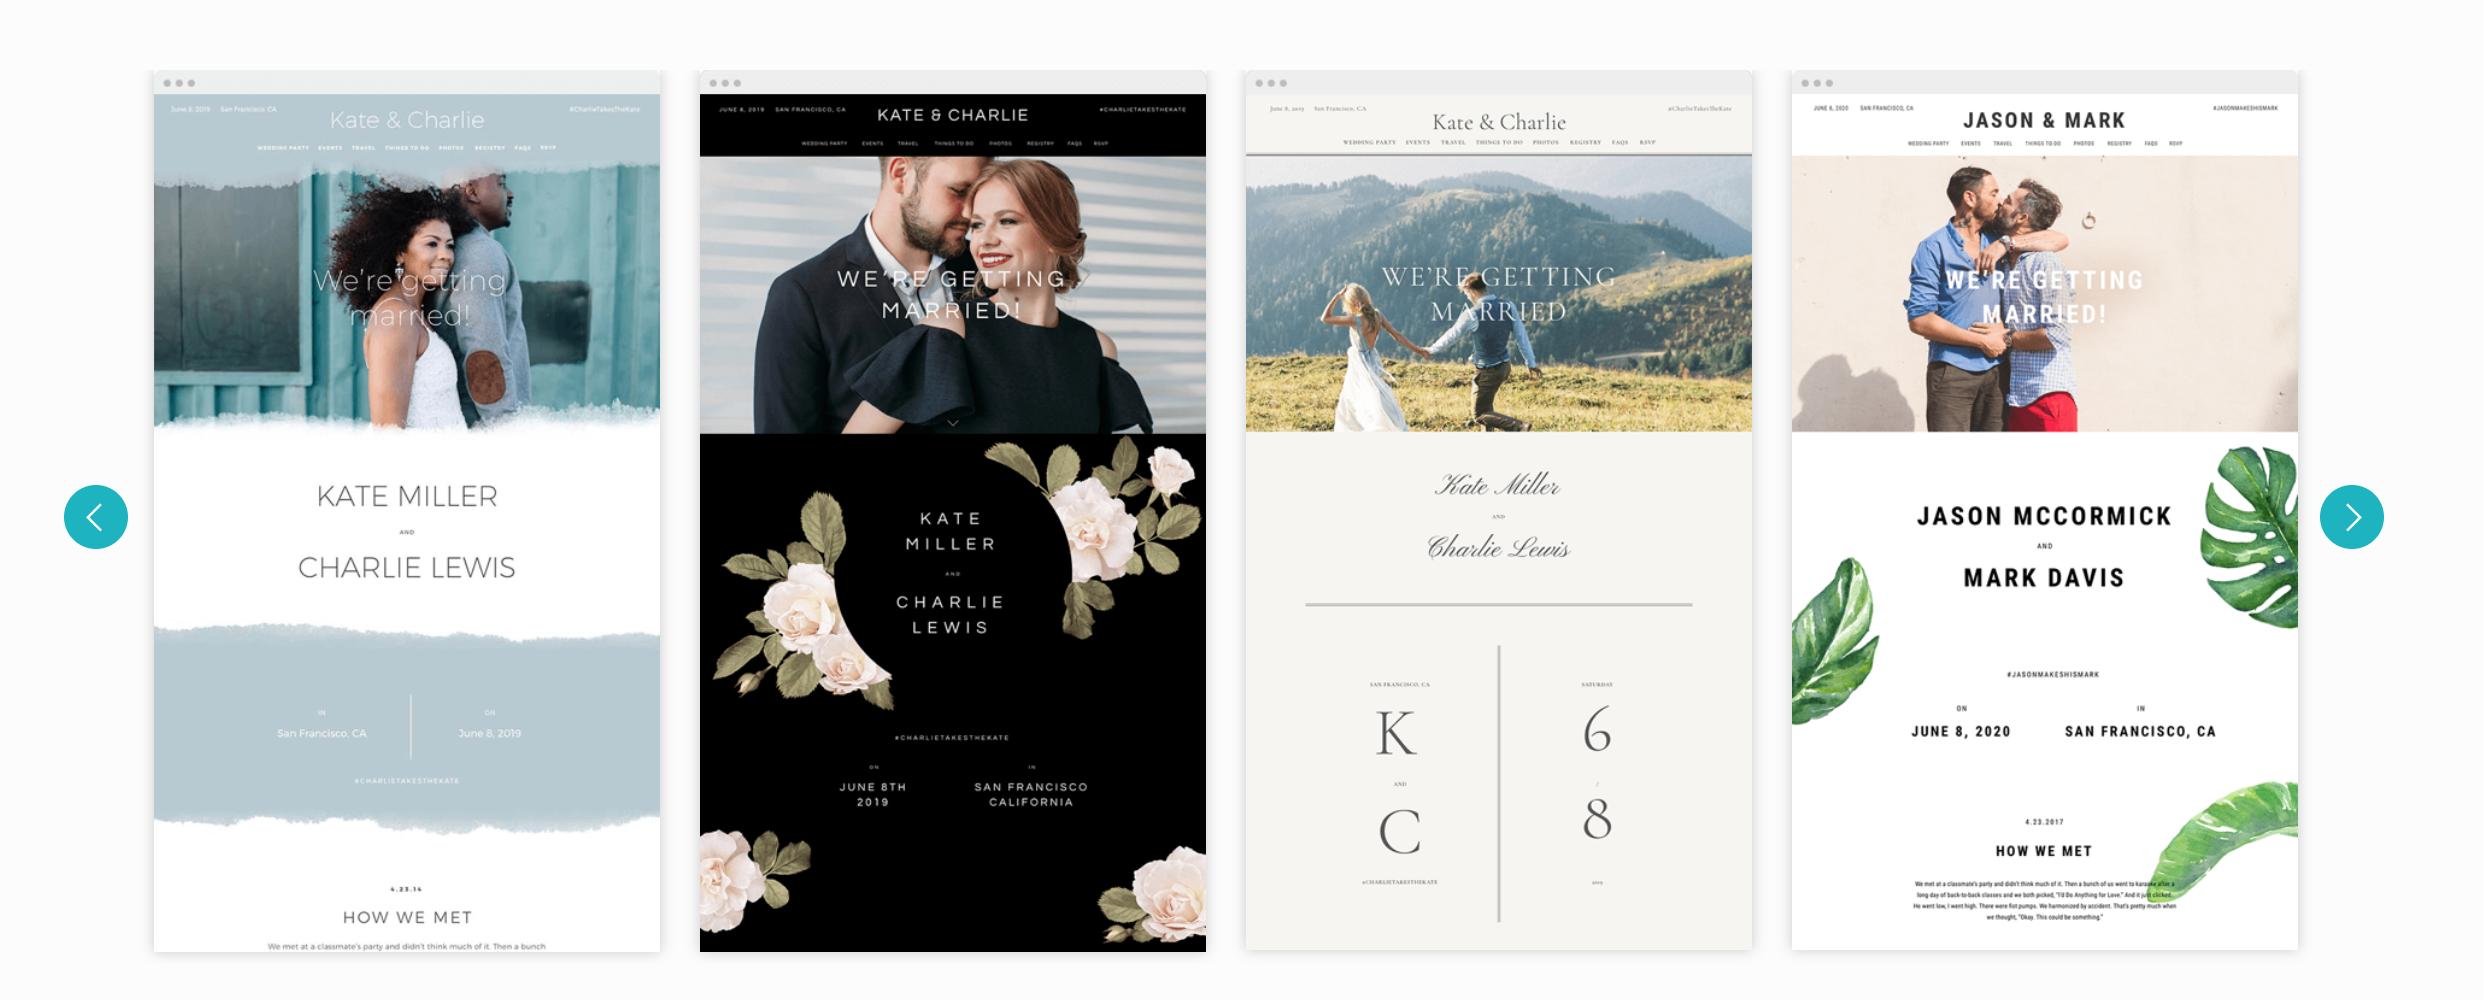 Zola wedding website